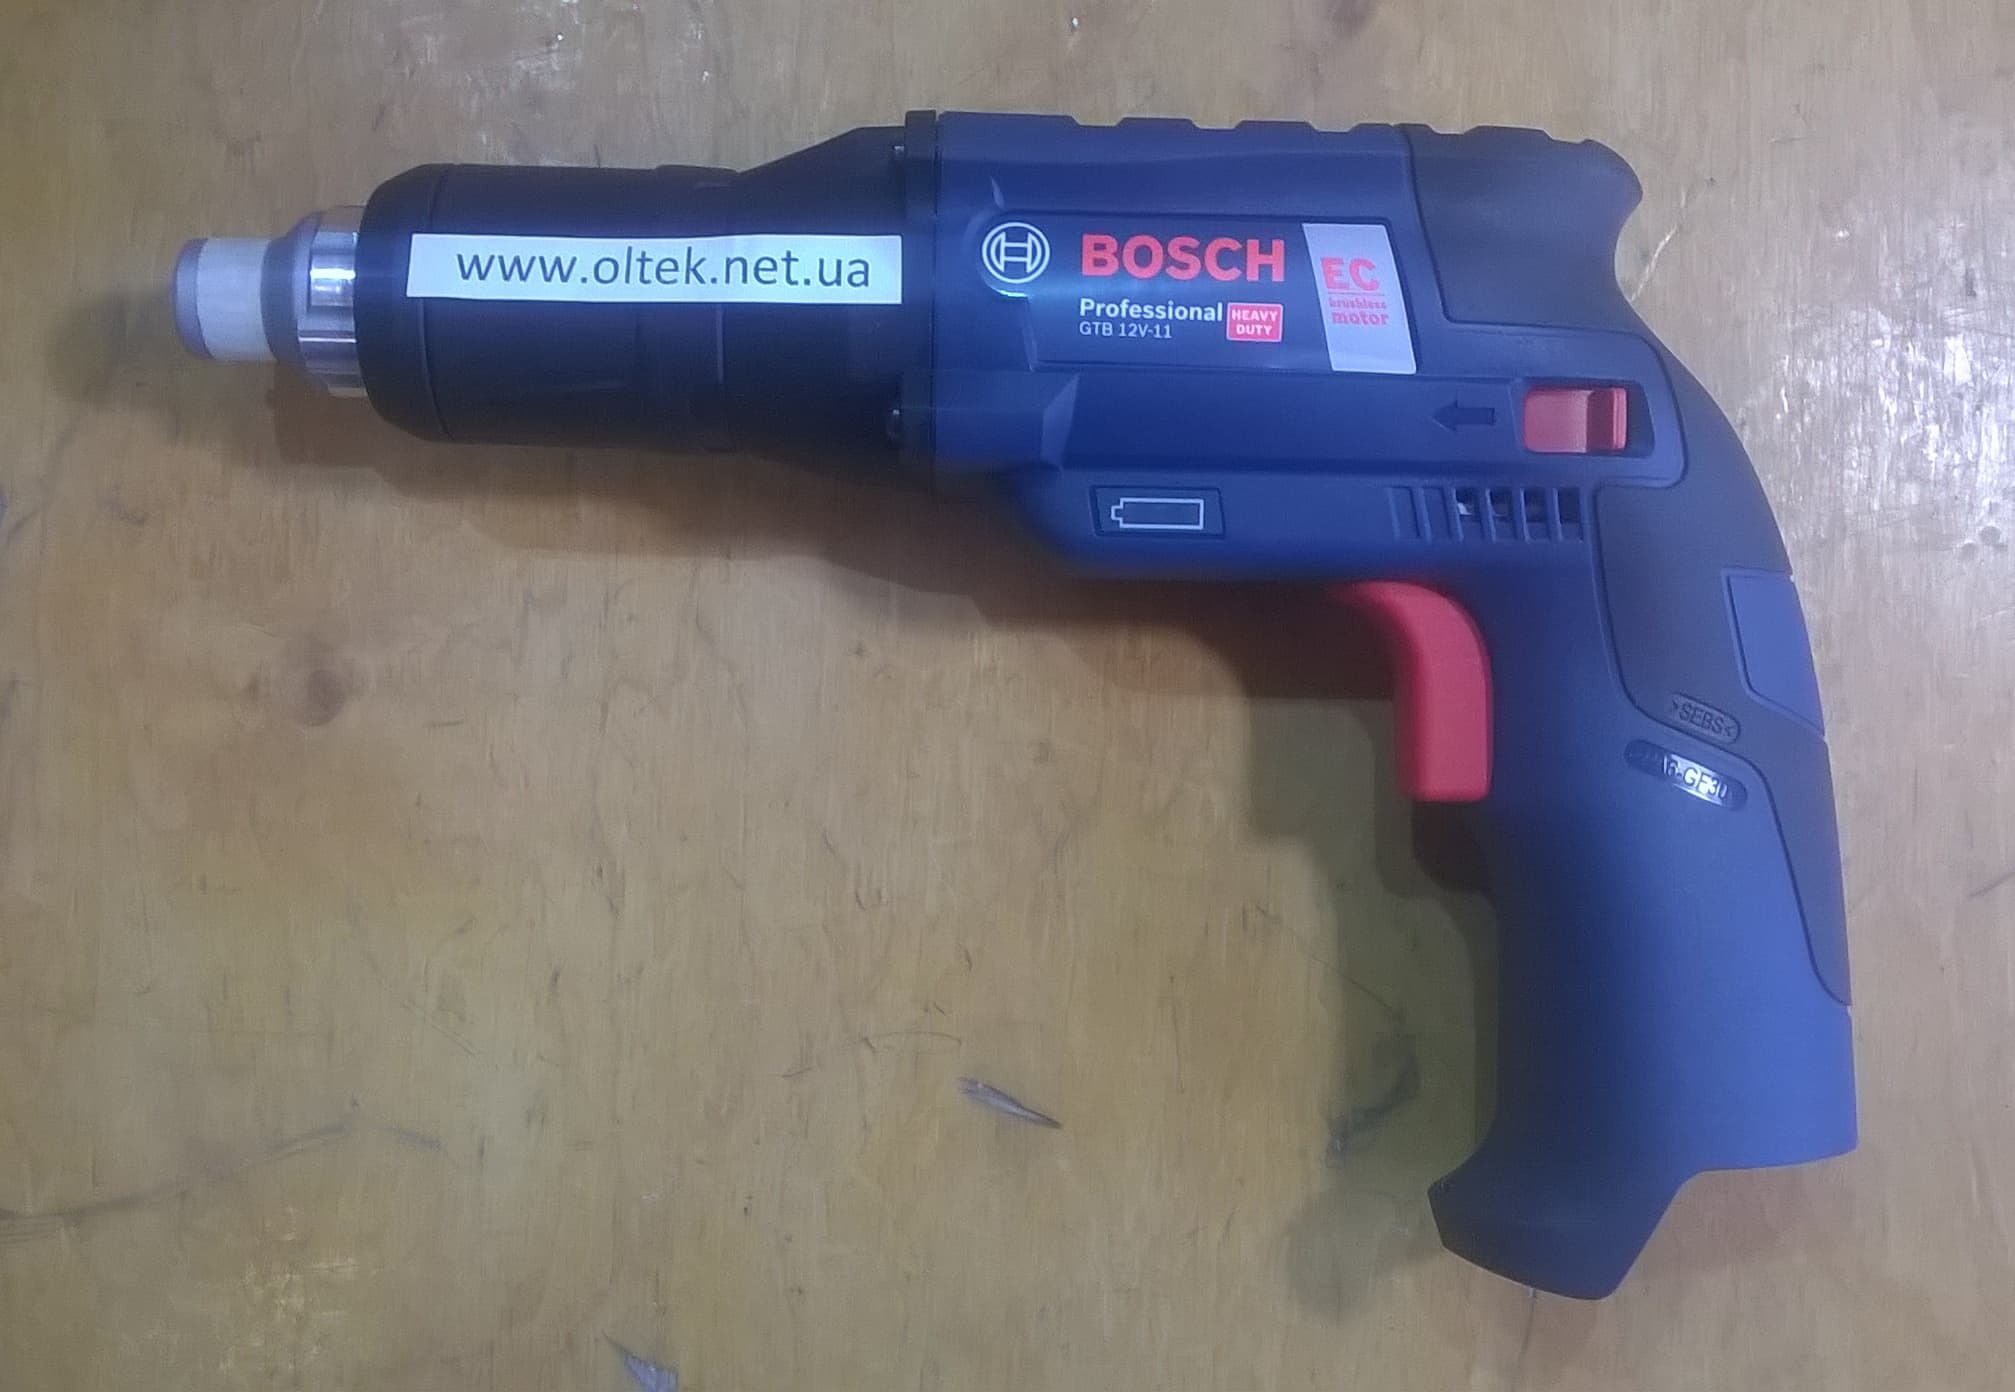 bosch-gtb-12V-11-oltek-net-ua